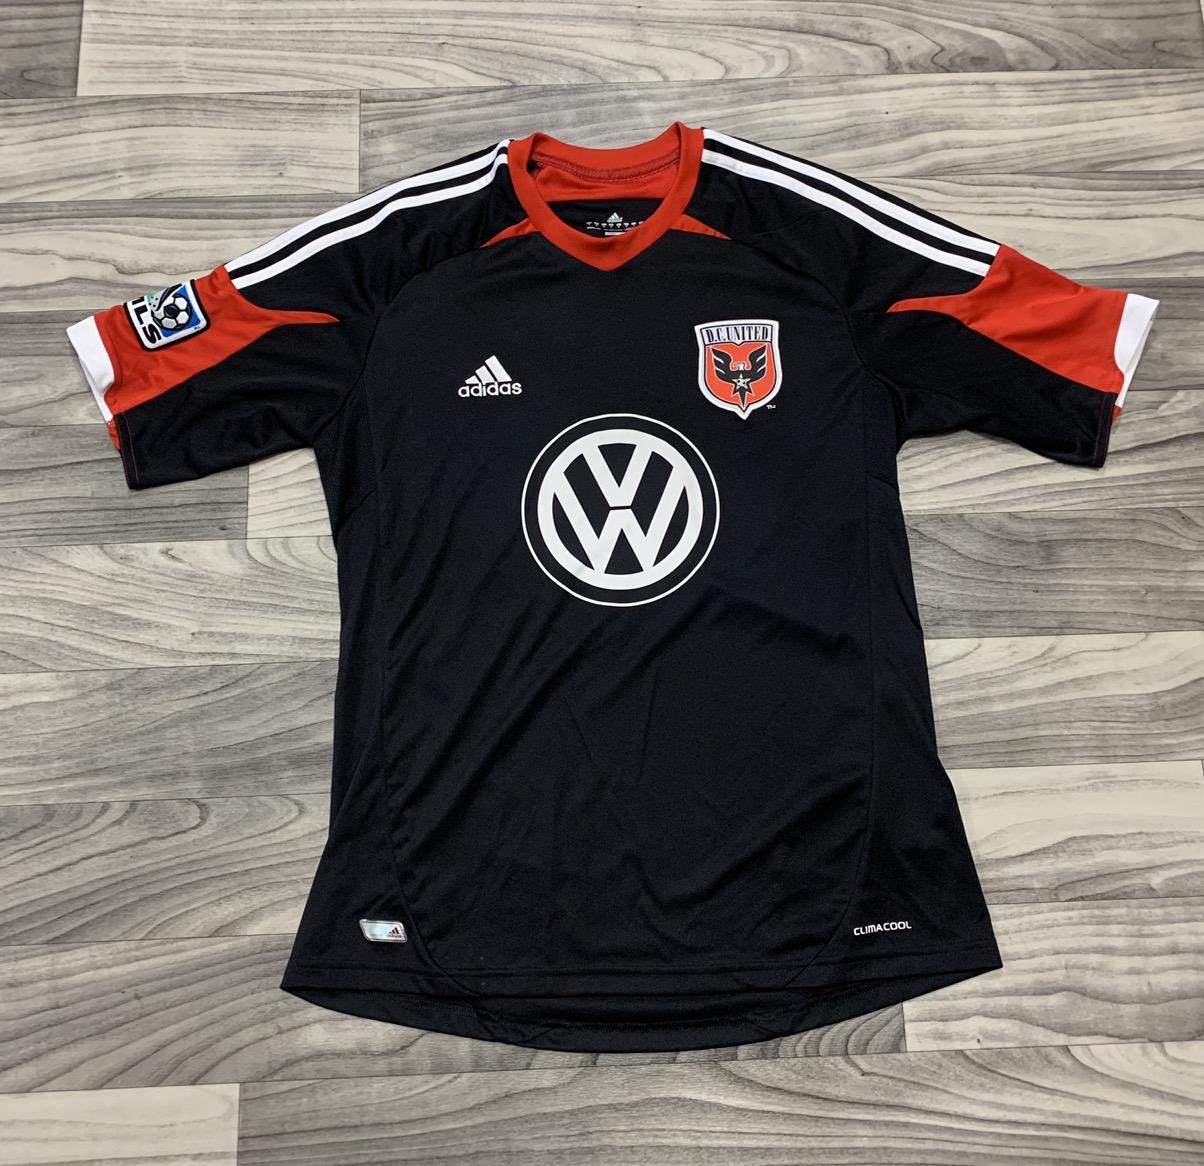 Adidas Adidas Climacool MLS D.C. United Soccer Jersey